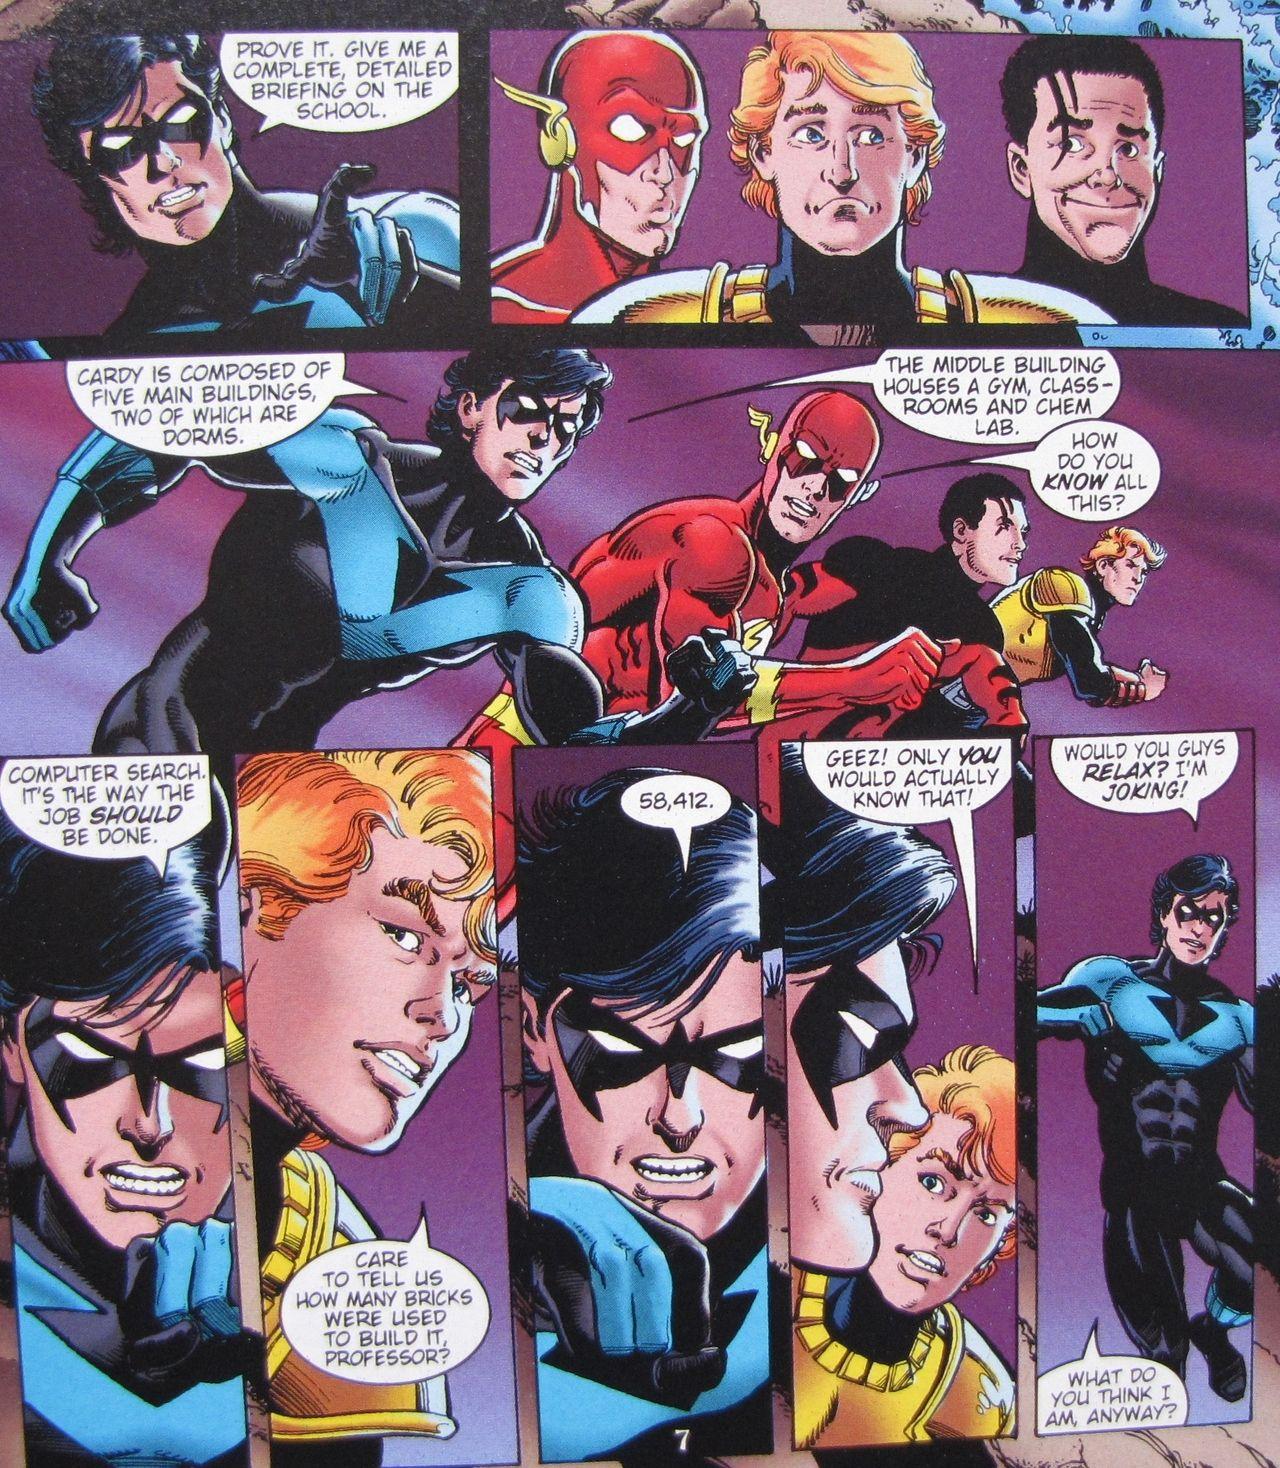 Nightwing is turning into Batman